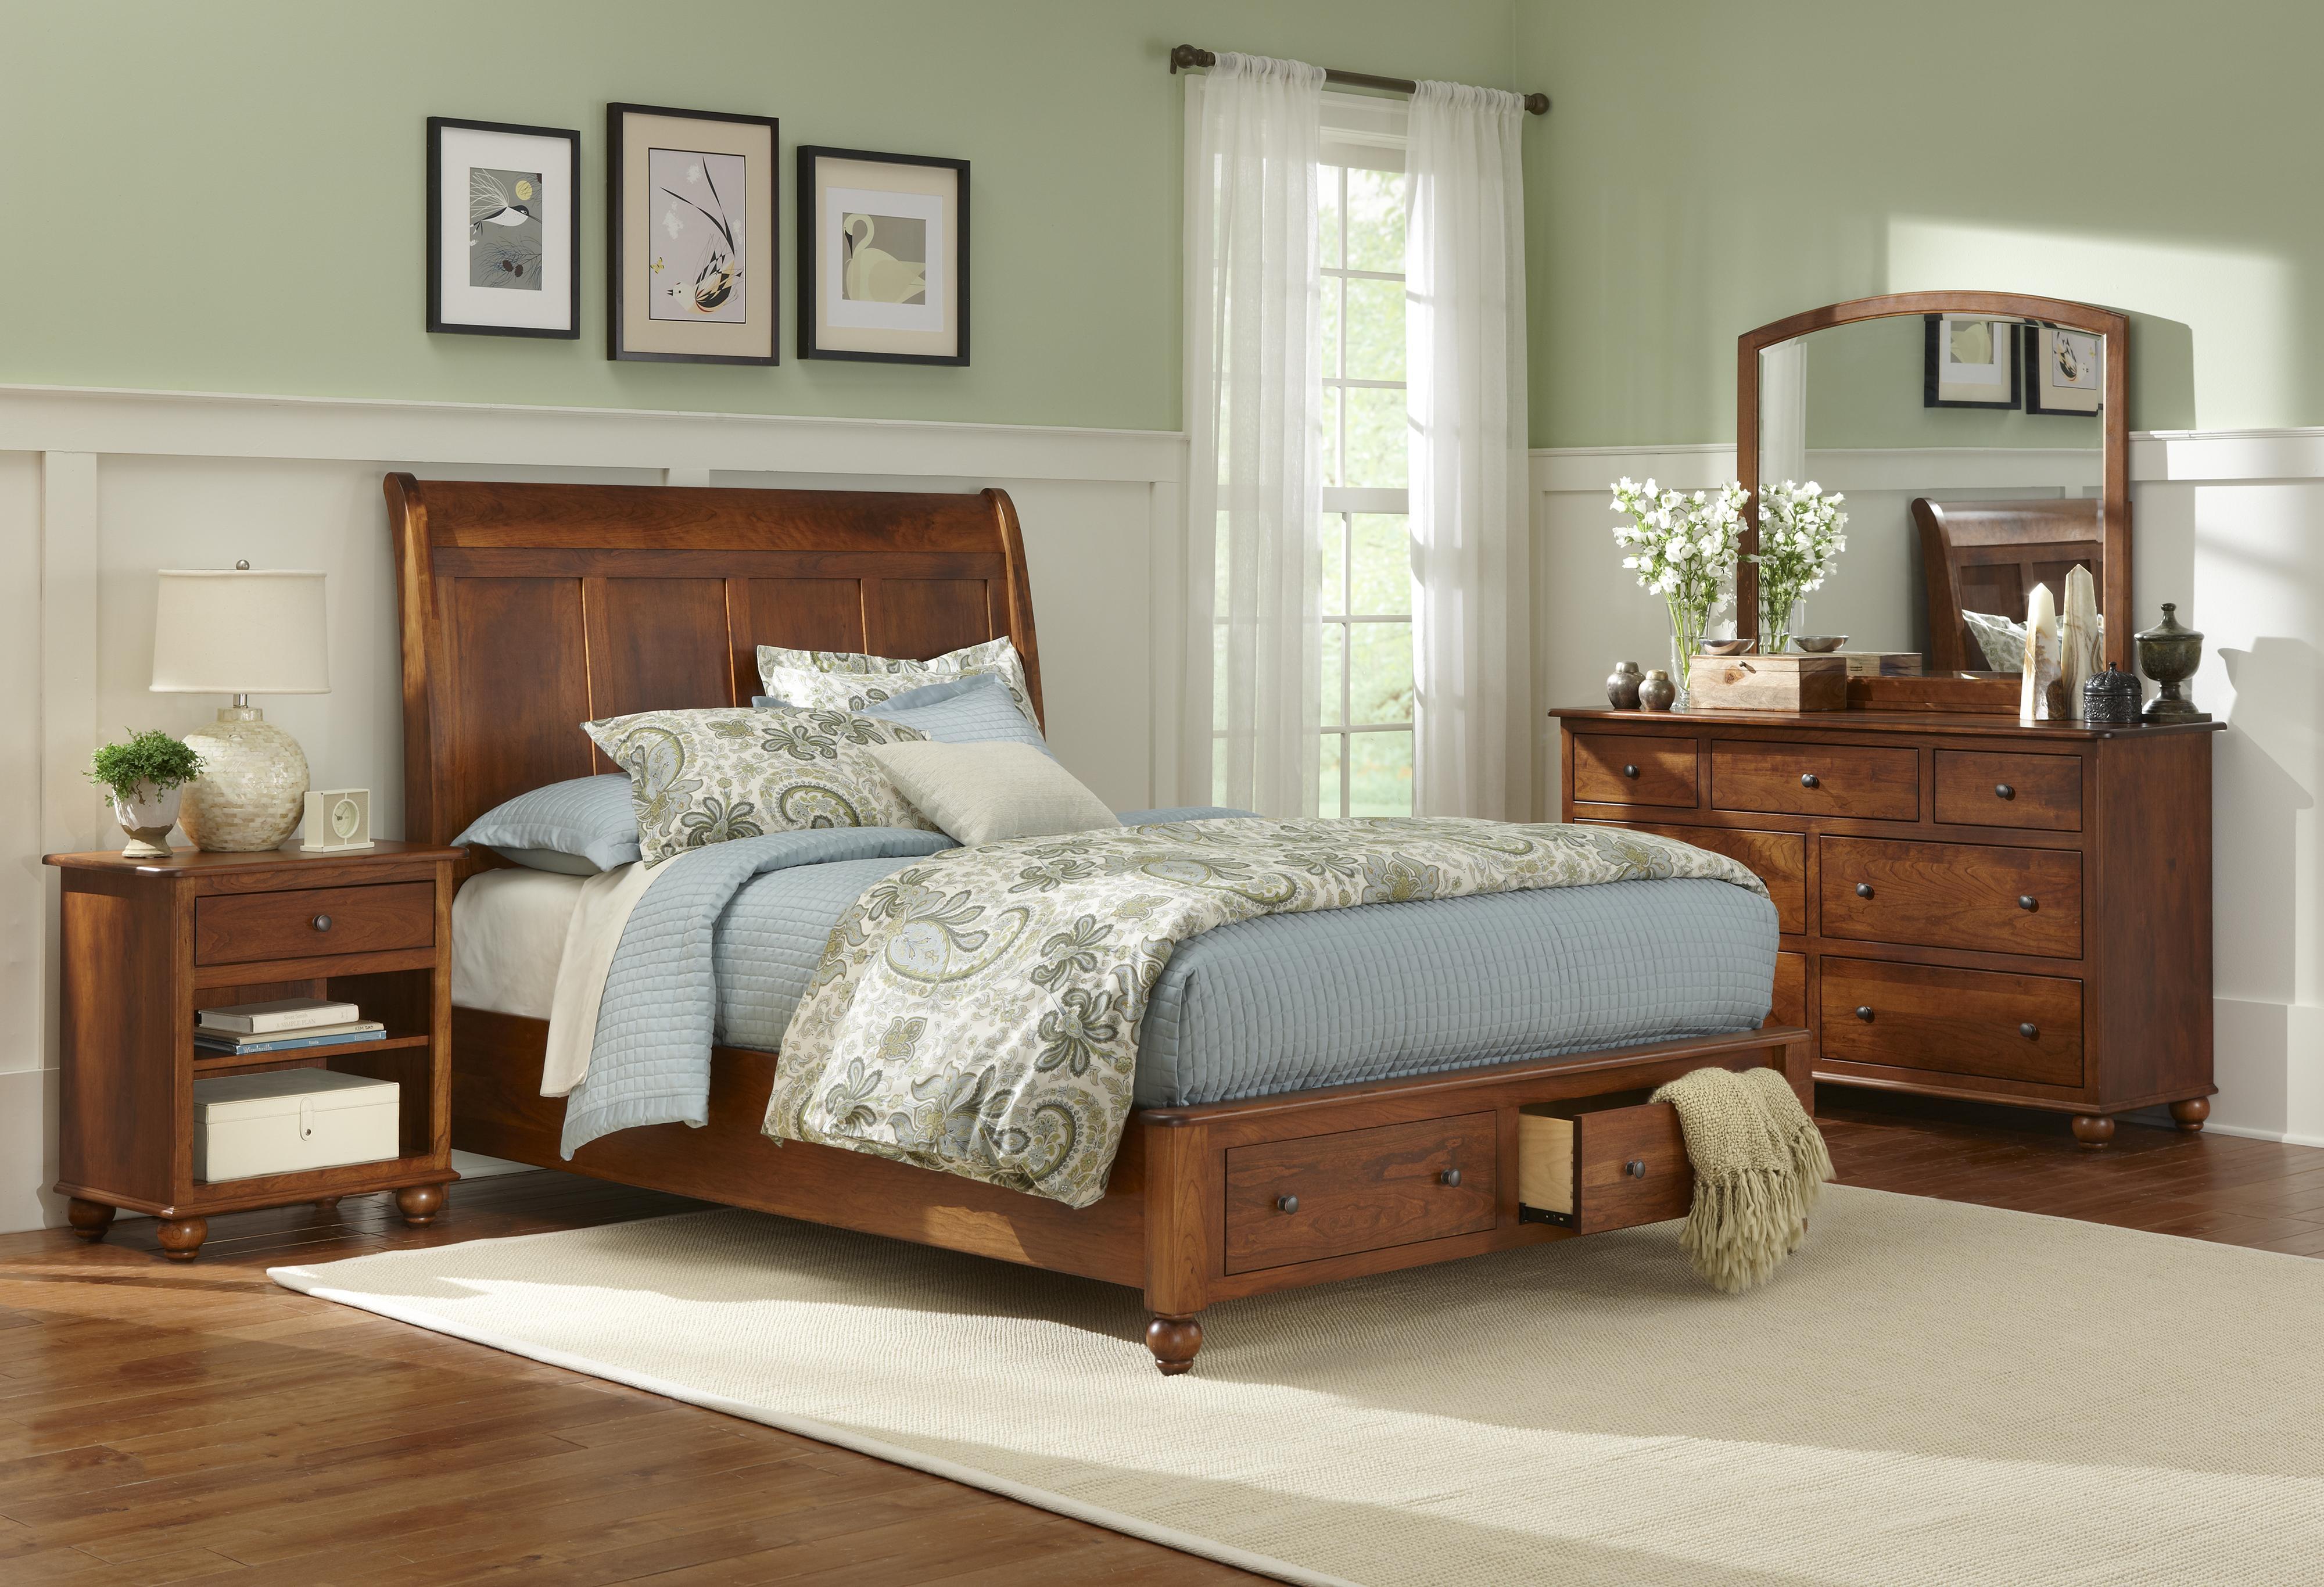 Covington Covington King Storage Bed at Morris Home